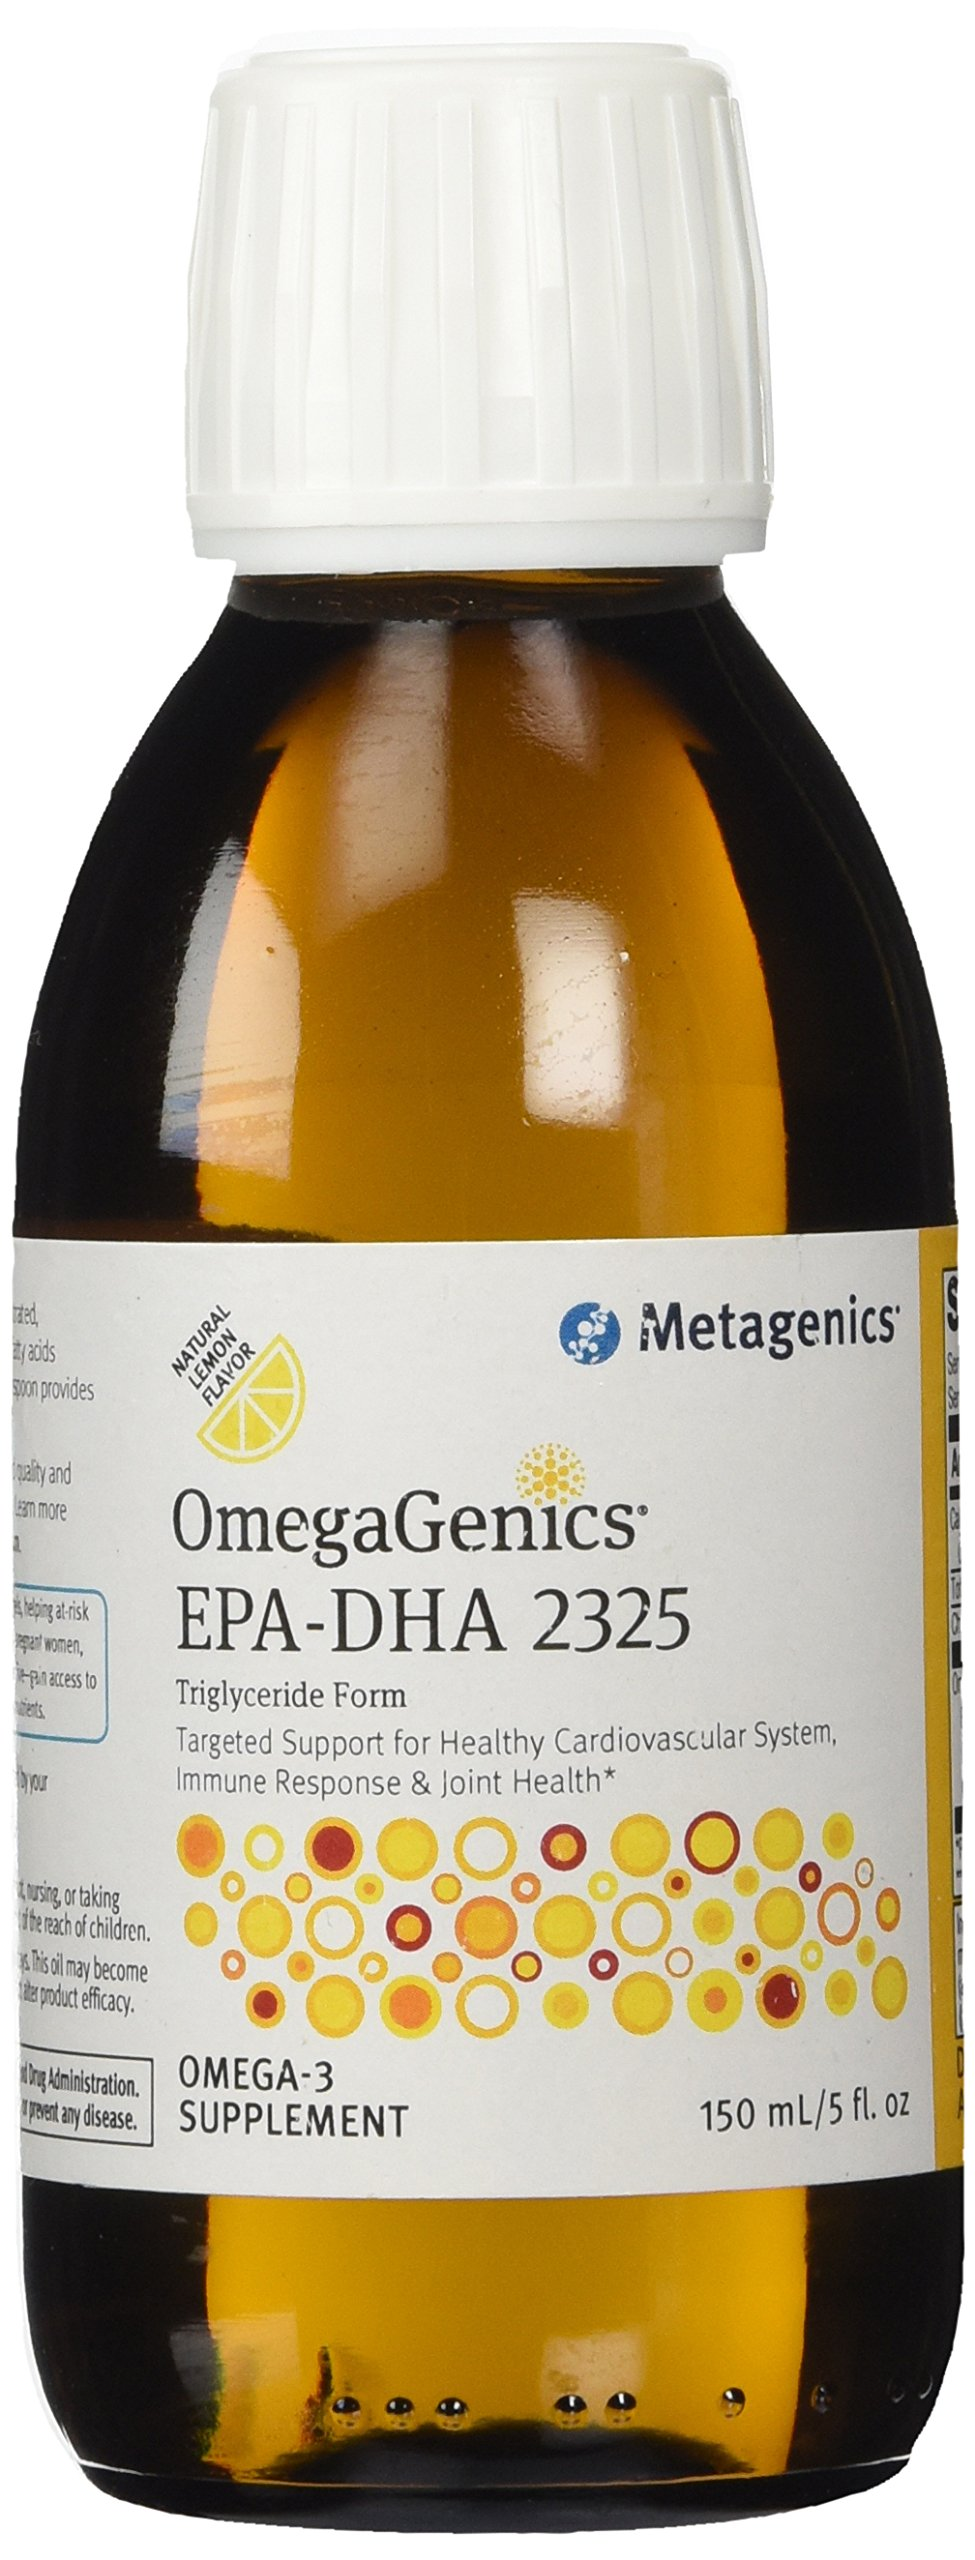 Metagenics - OmegaGenics EPA-DHA 2325 Liquid Natural Lemon Flavor - 150 ml. (formerly EPA-DHA High Concentrate Liquid)